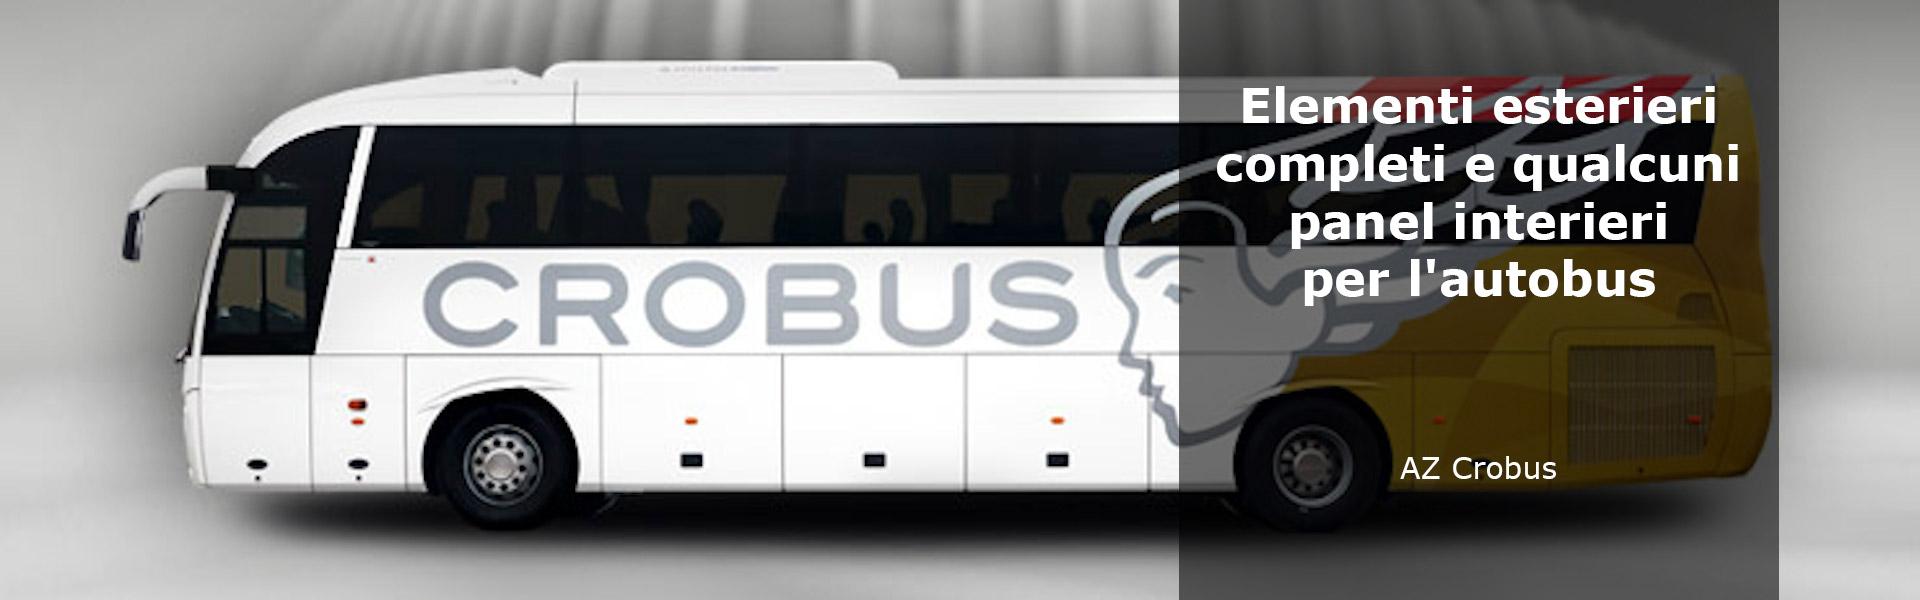 CROBUS-it